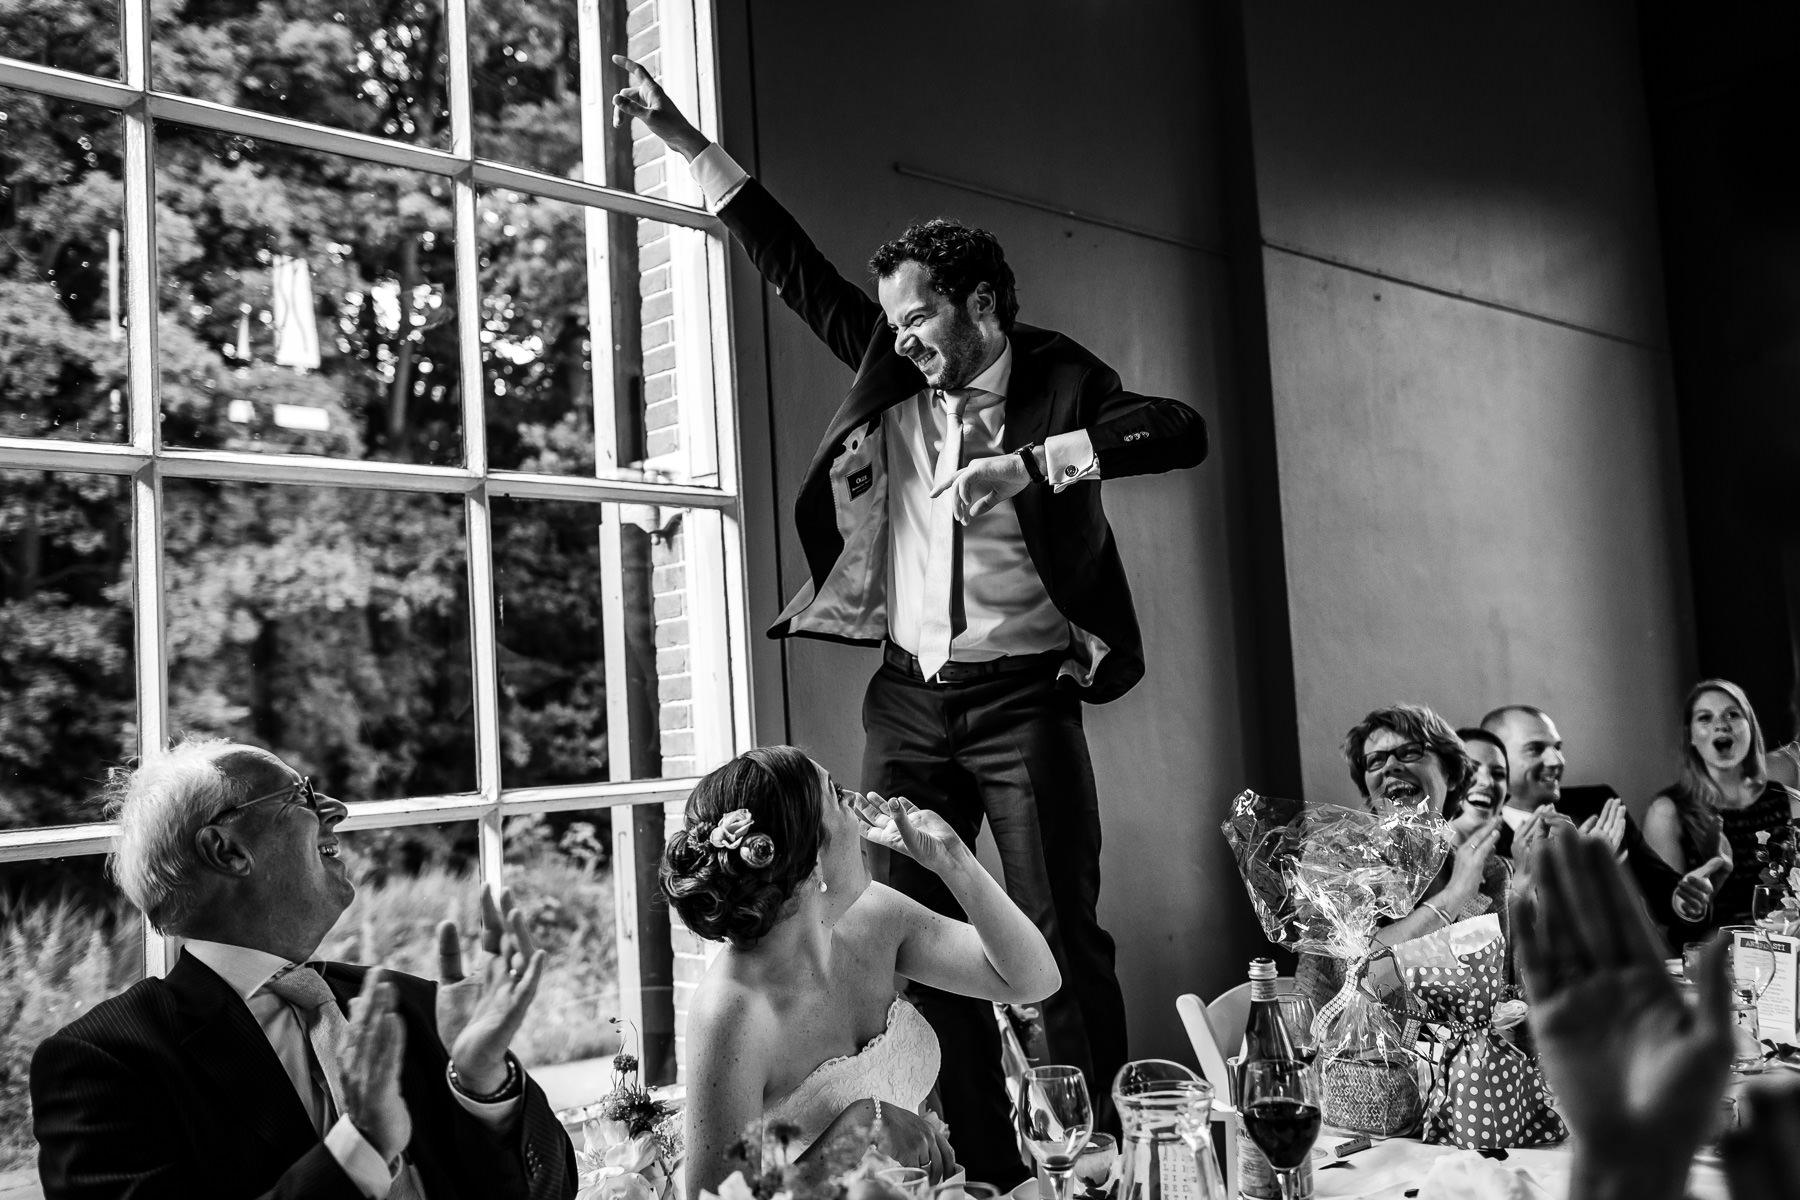 Bruidsfotografie | Originele trouwfoto's | Zwart-wit foto | Twentyfive Collective